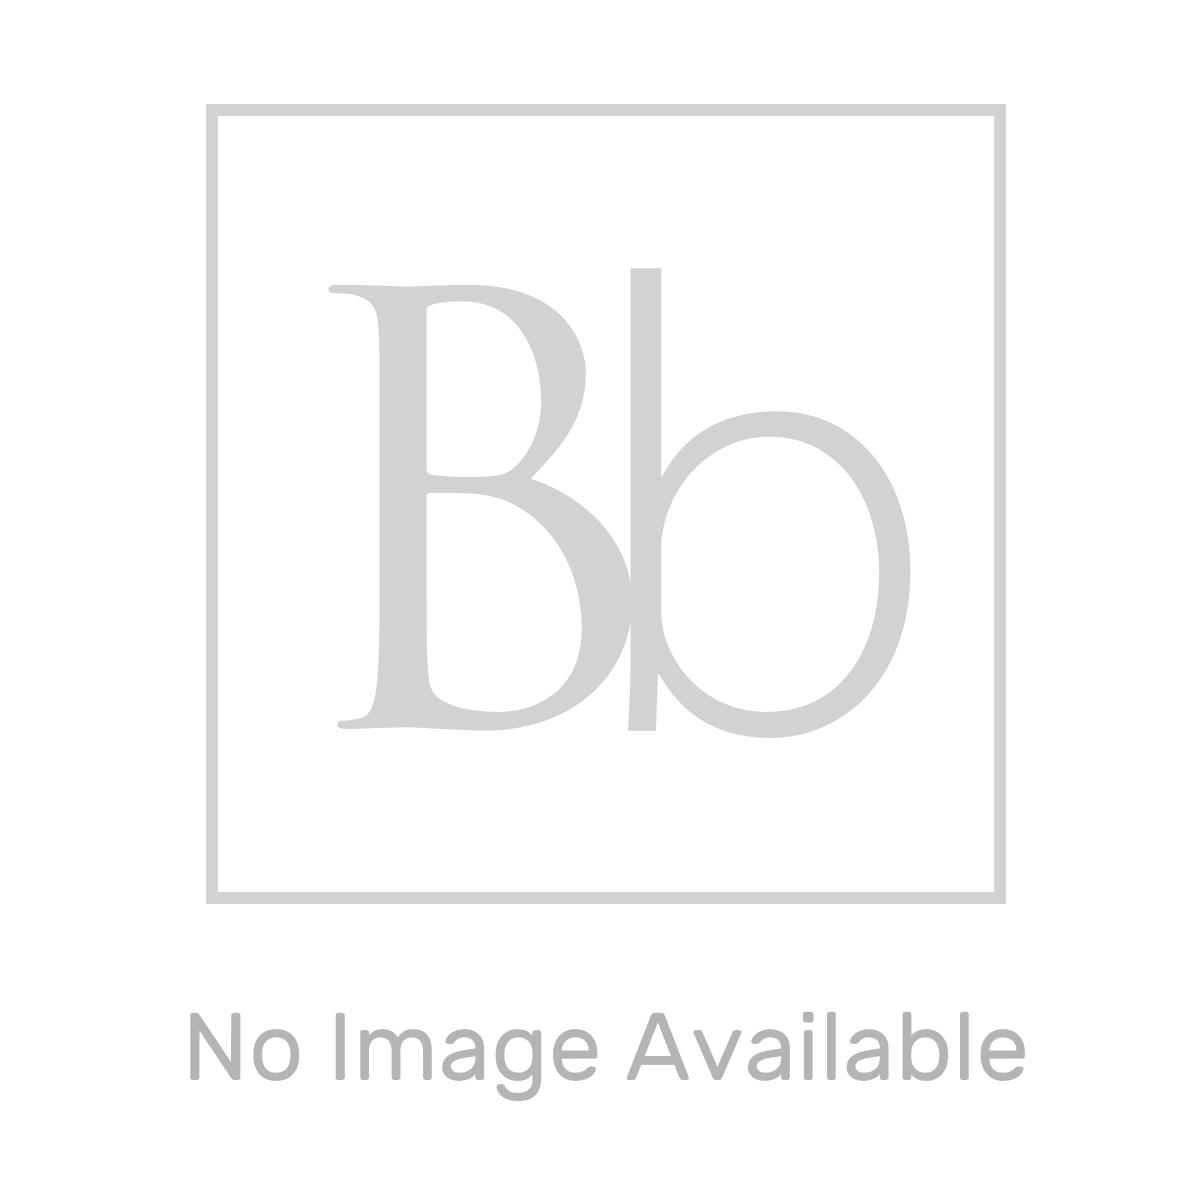 Ricadi Polished Stainless Steel Column Electric Radiator 840 x 500mm Detail 1